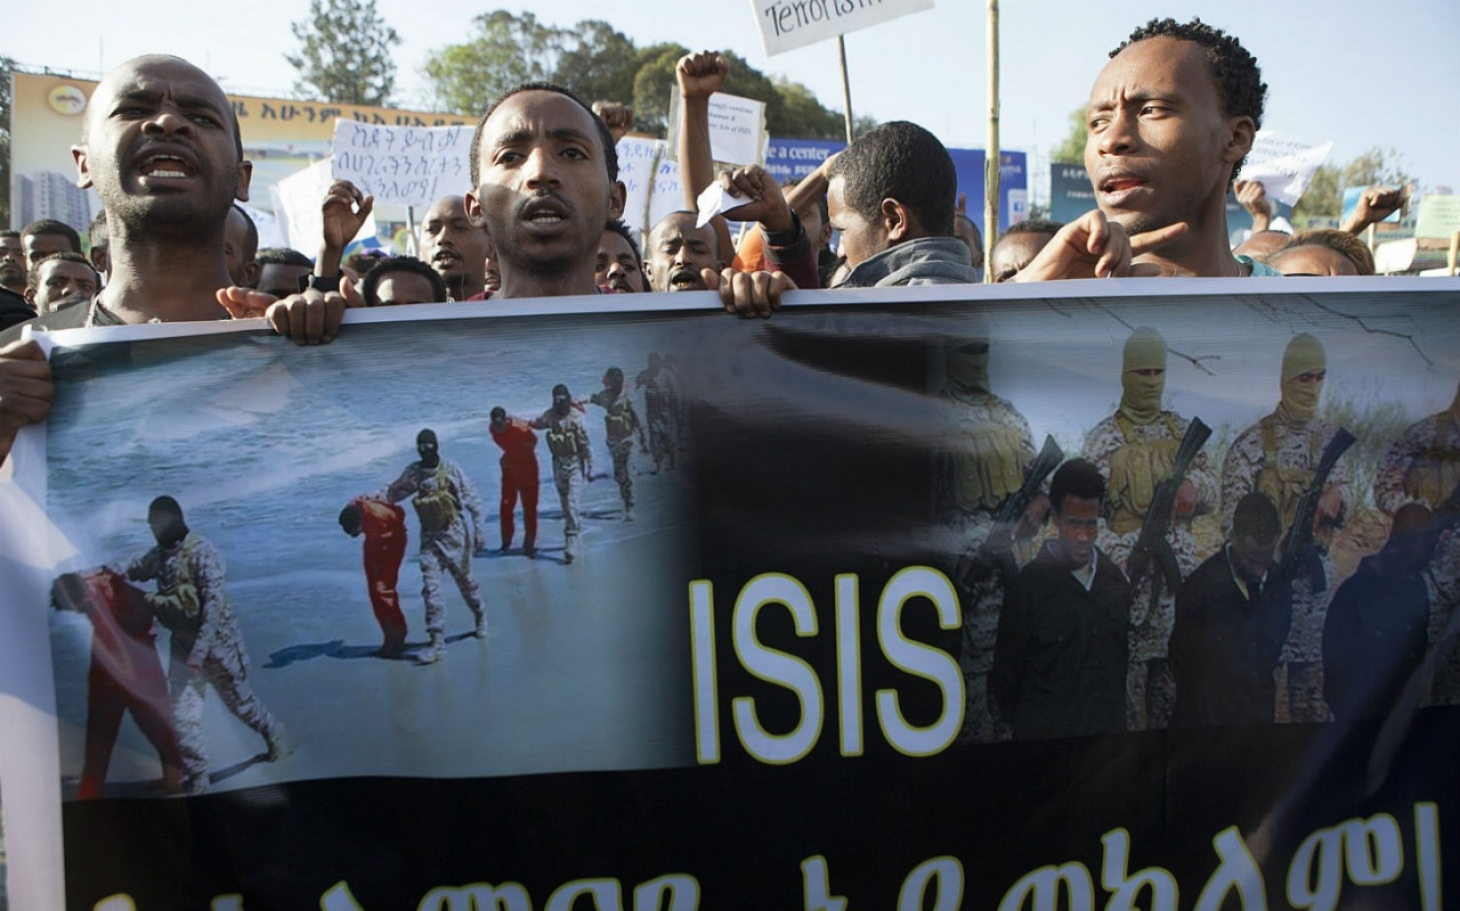 More Than 100,000 Ethiopians March Against ISIL | Al Jazeera America